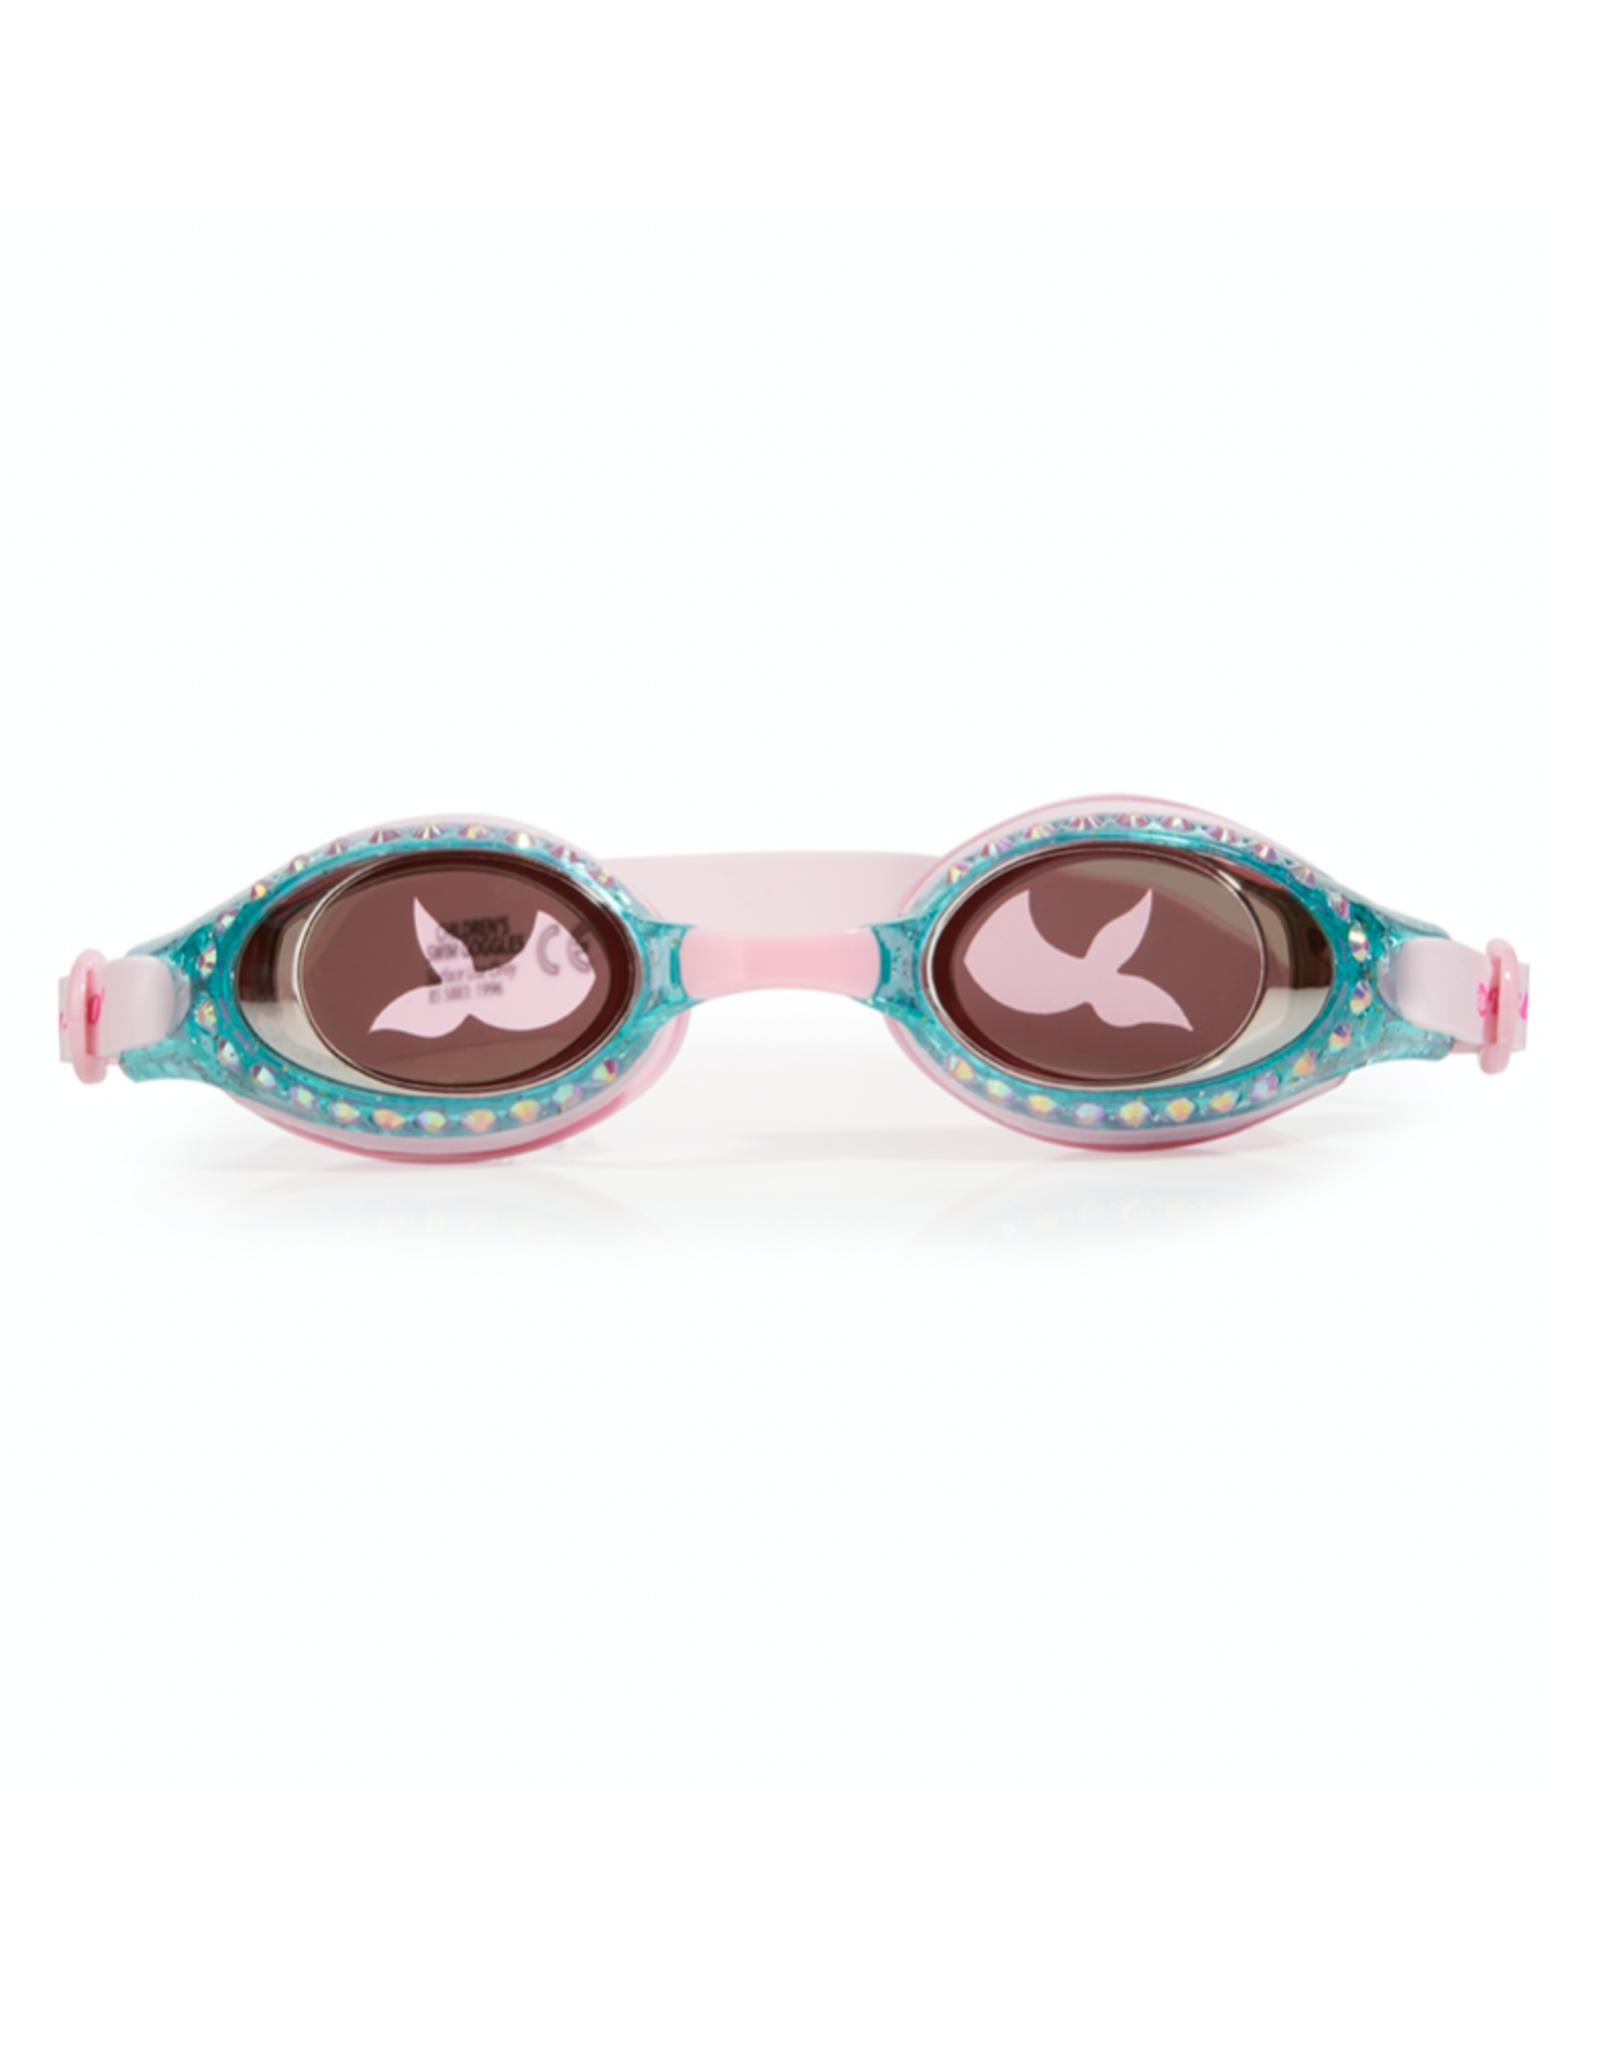 Bling2o Bling2o Goggles - Mermaid Jewel Pink